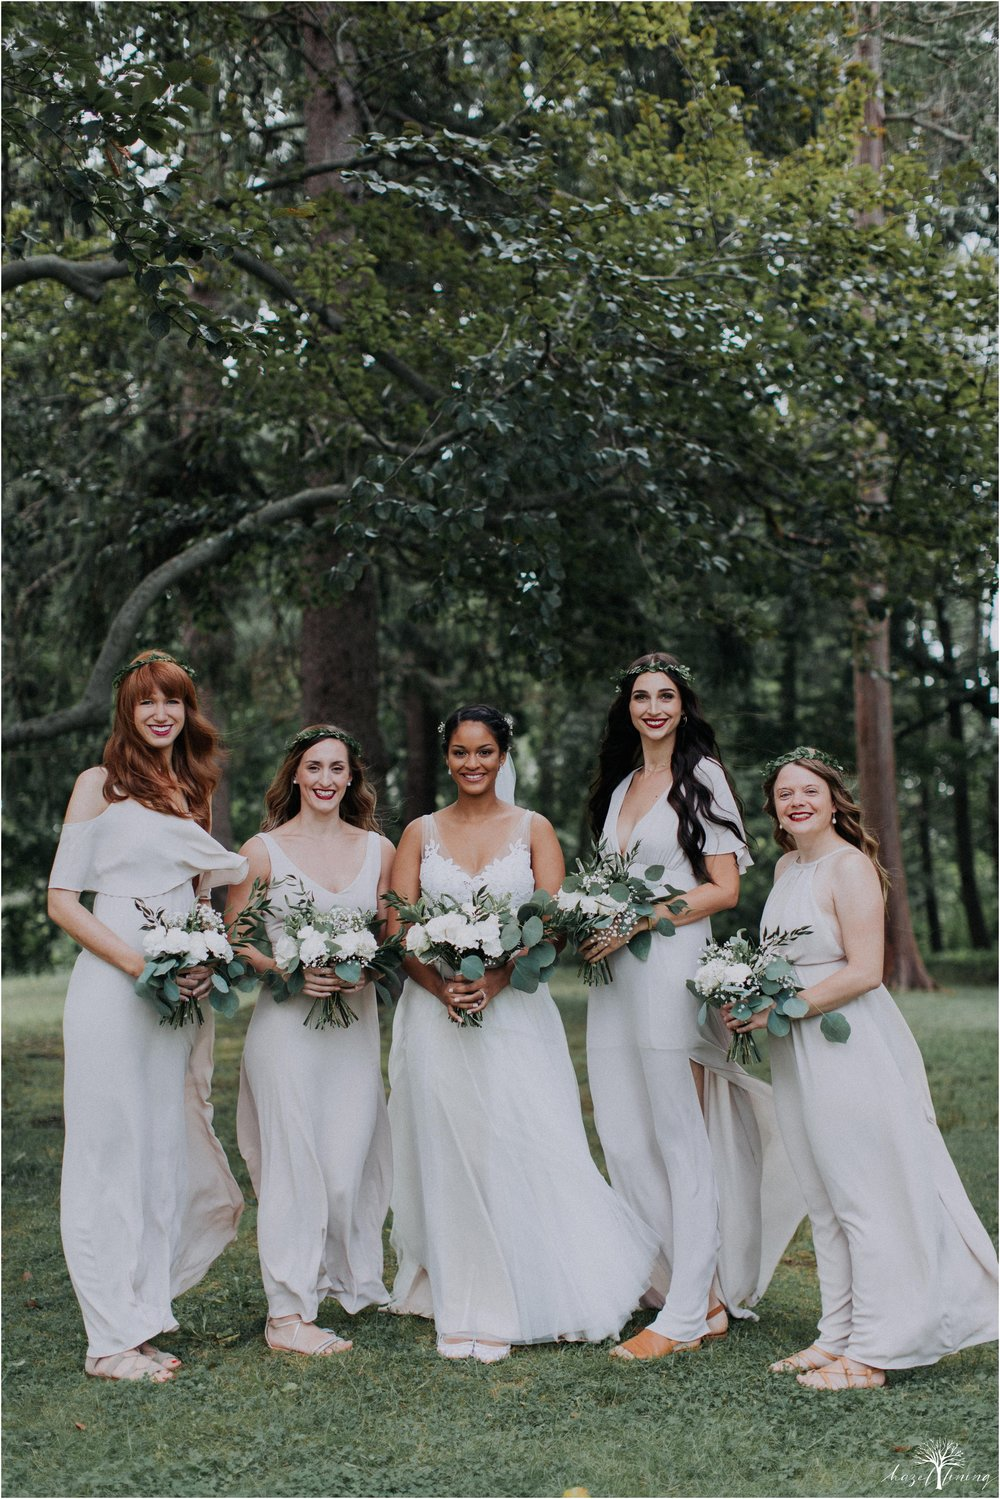 mariah-kreyling-samuel-sherratt-sherrattwiththeworld-peirce-farm-at-witch-hill-boston-massachusetts-wedding-photography-hazel-lining-travel-wedding-elopement-photography_0028.jpg